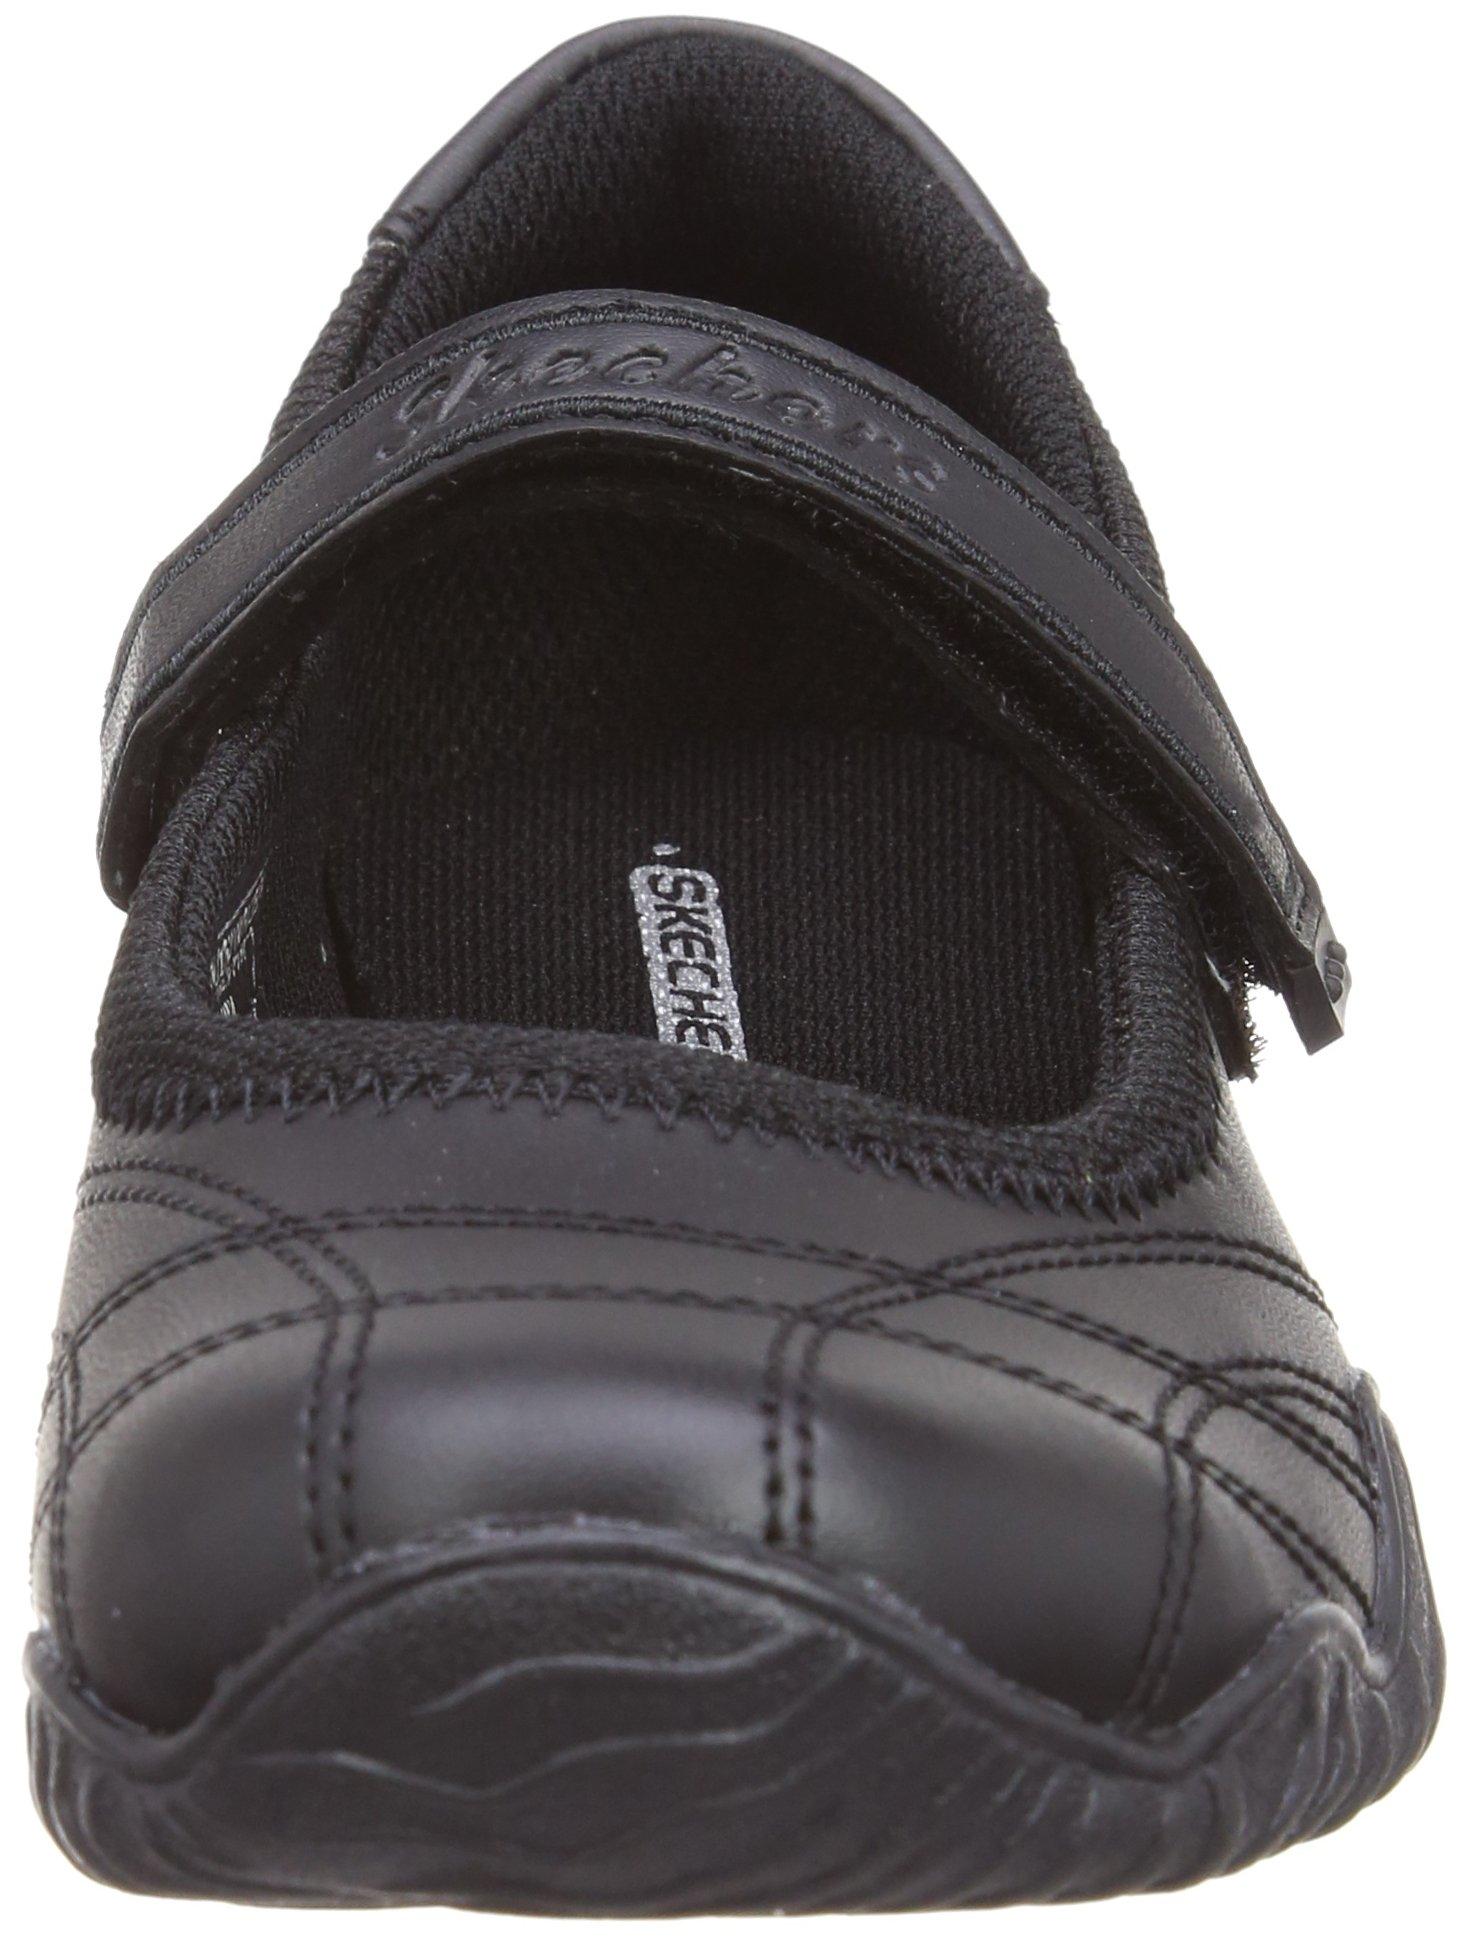 Skechers Velocity Pouty – Bailarinas de cuero niña